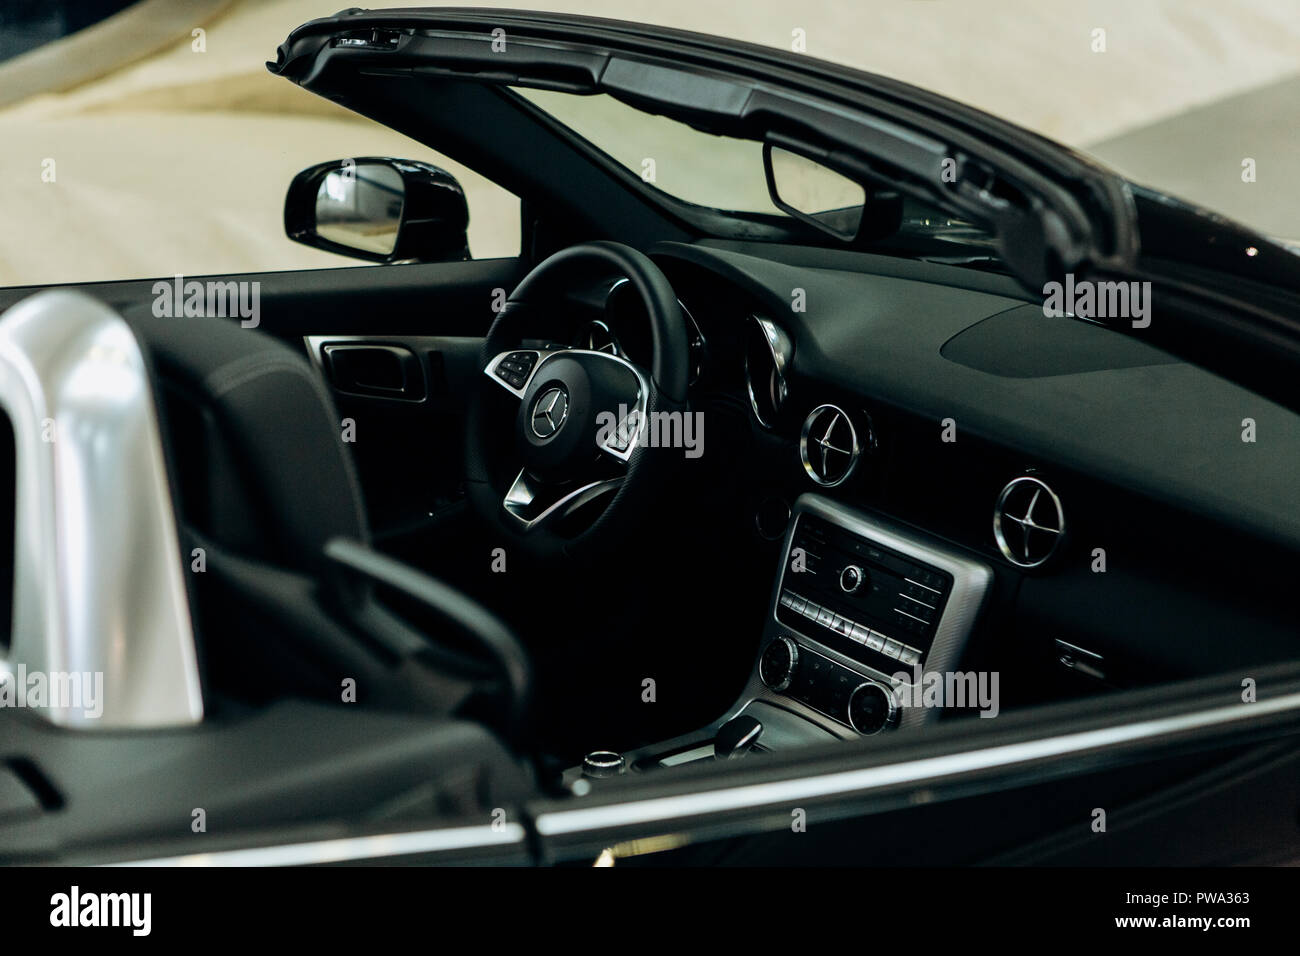 Berlin August 29 2018 Inside The New Mercedes Benz Car Steering